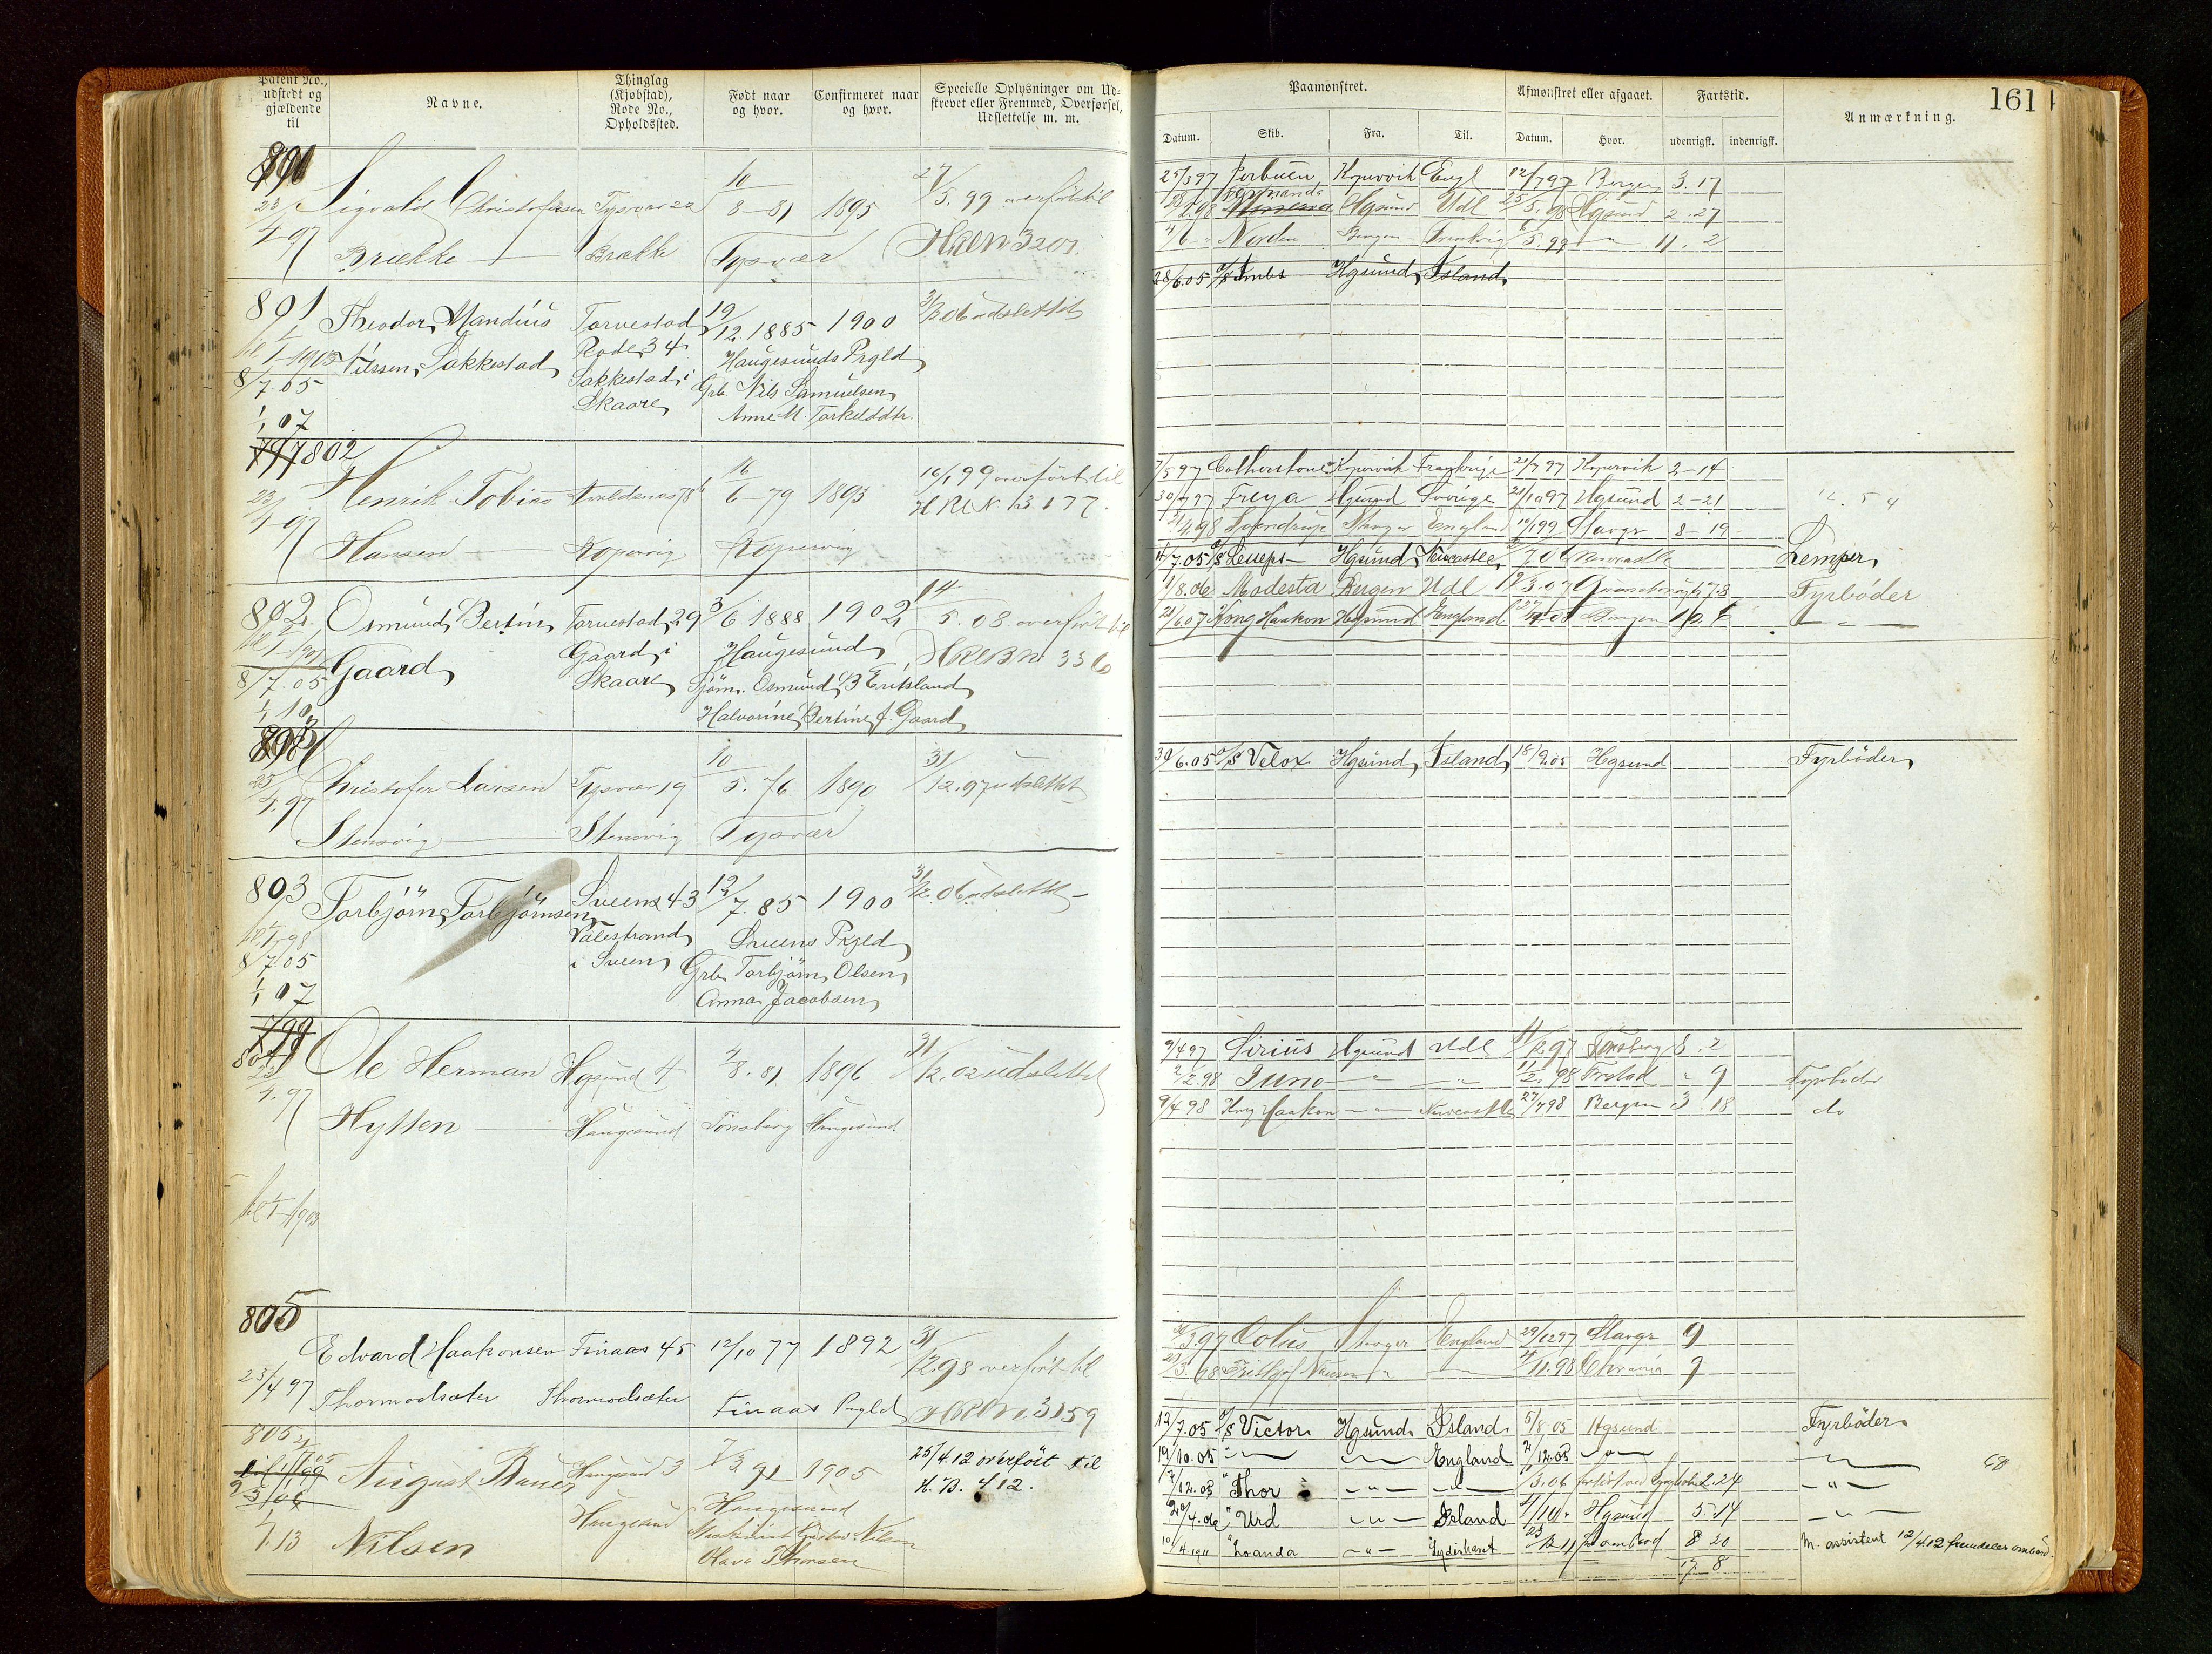 SAST, Haugesund sjømannskontor*, s. 161